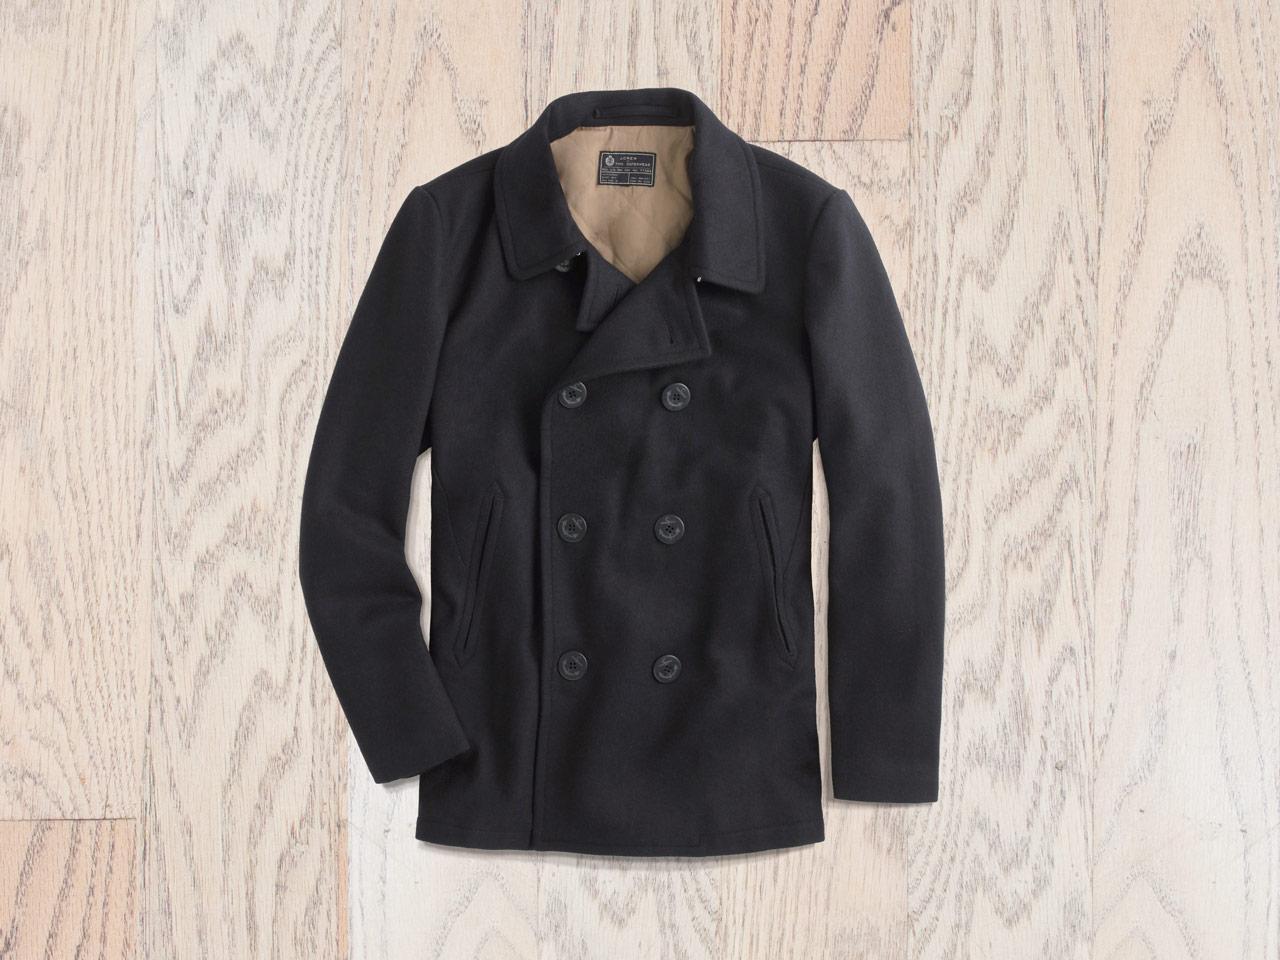 effortless essentials minimalist wardrobe - outerwear_peacoat